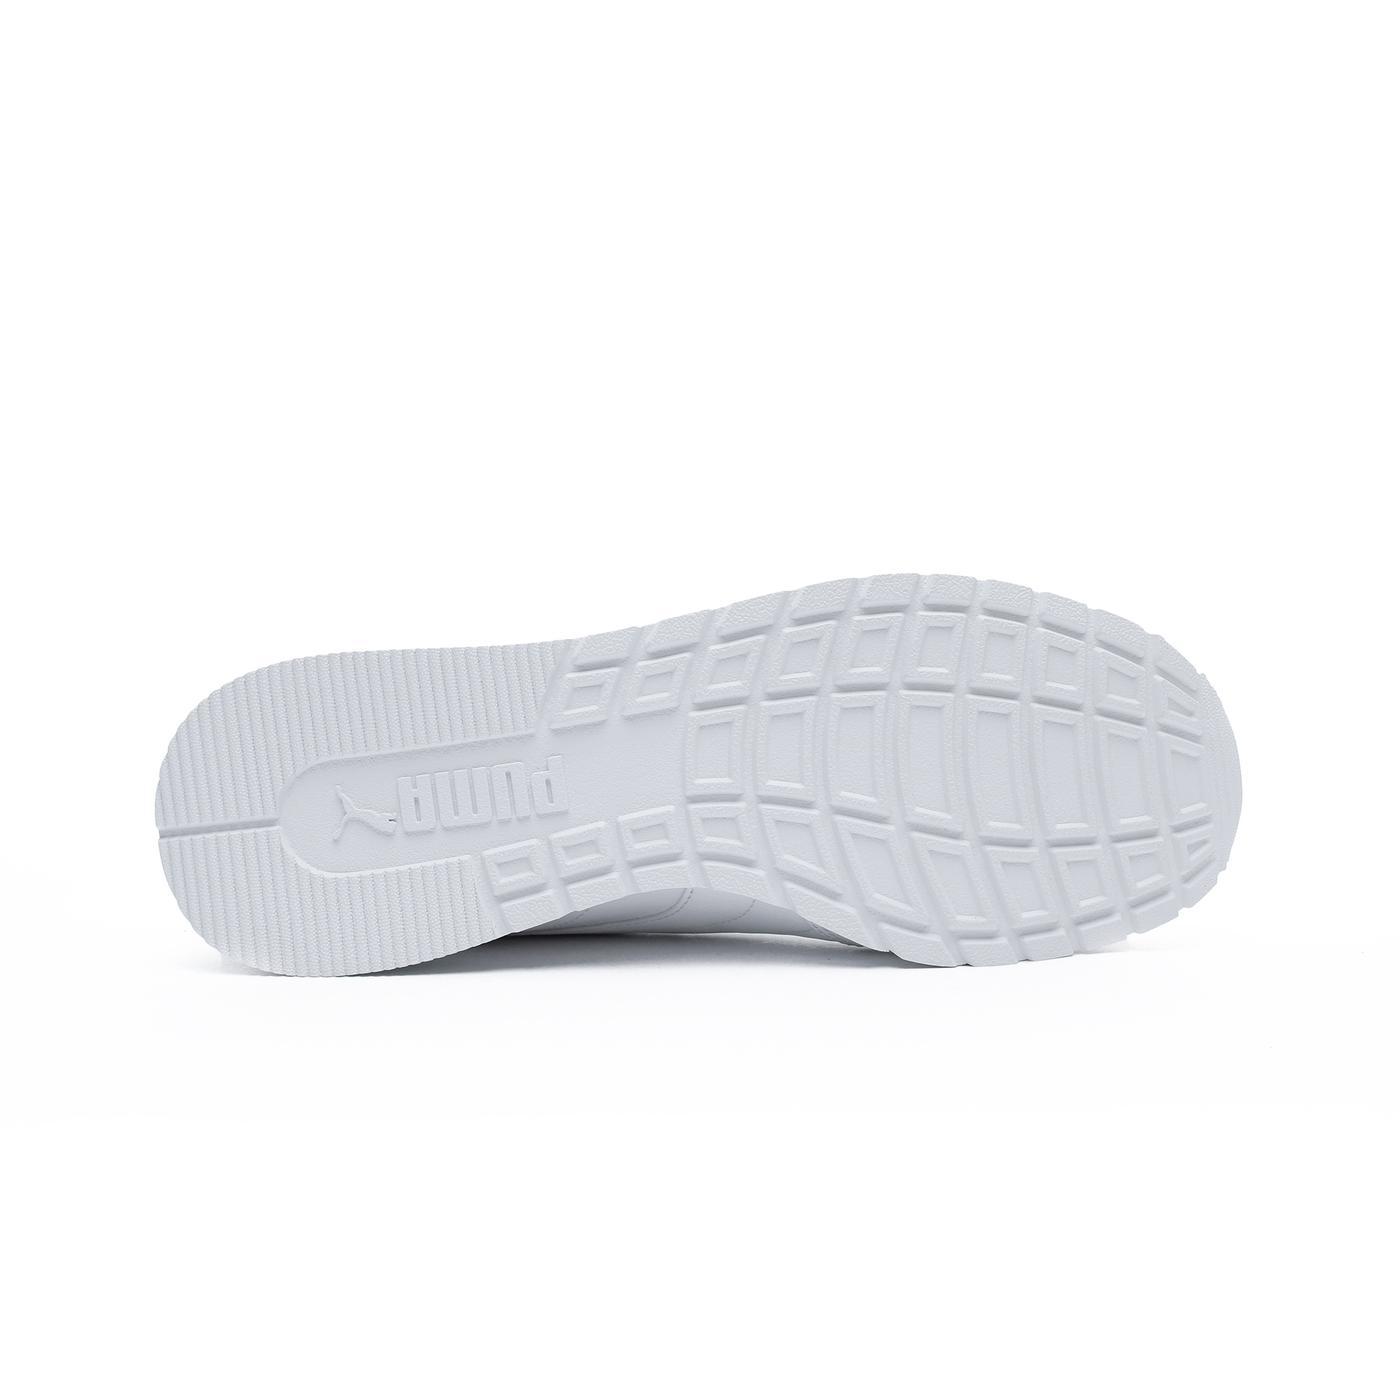 Puma ST Runner v2 Full L Erkek Beyaz Spor Ayakkabı